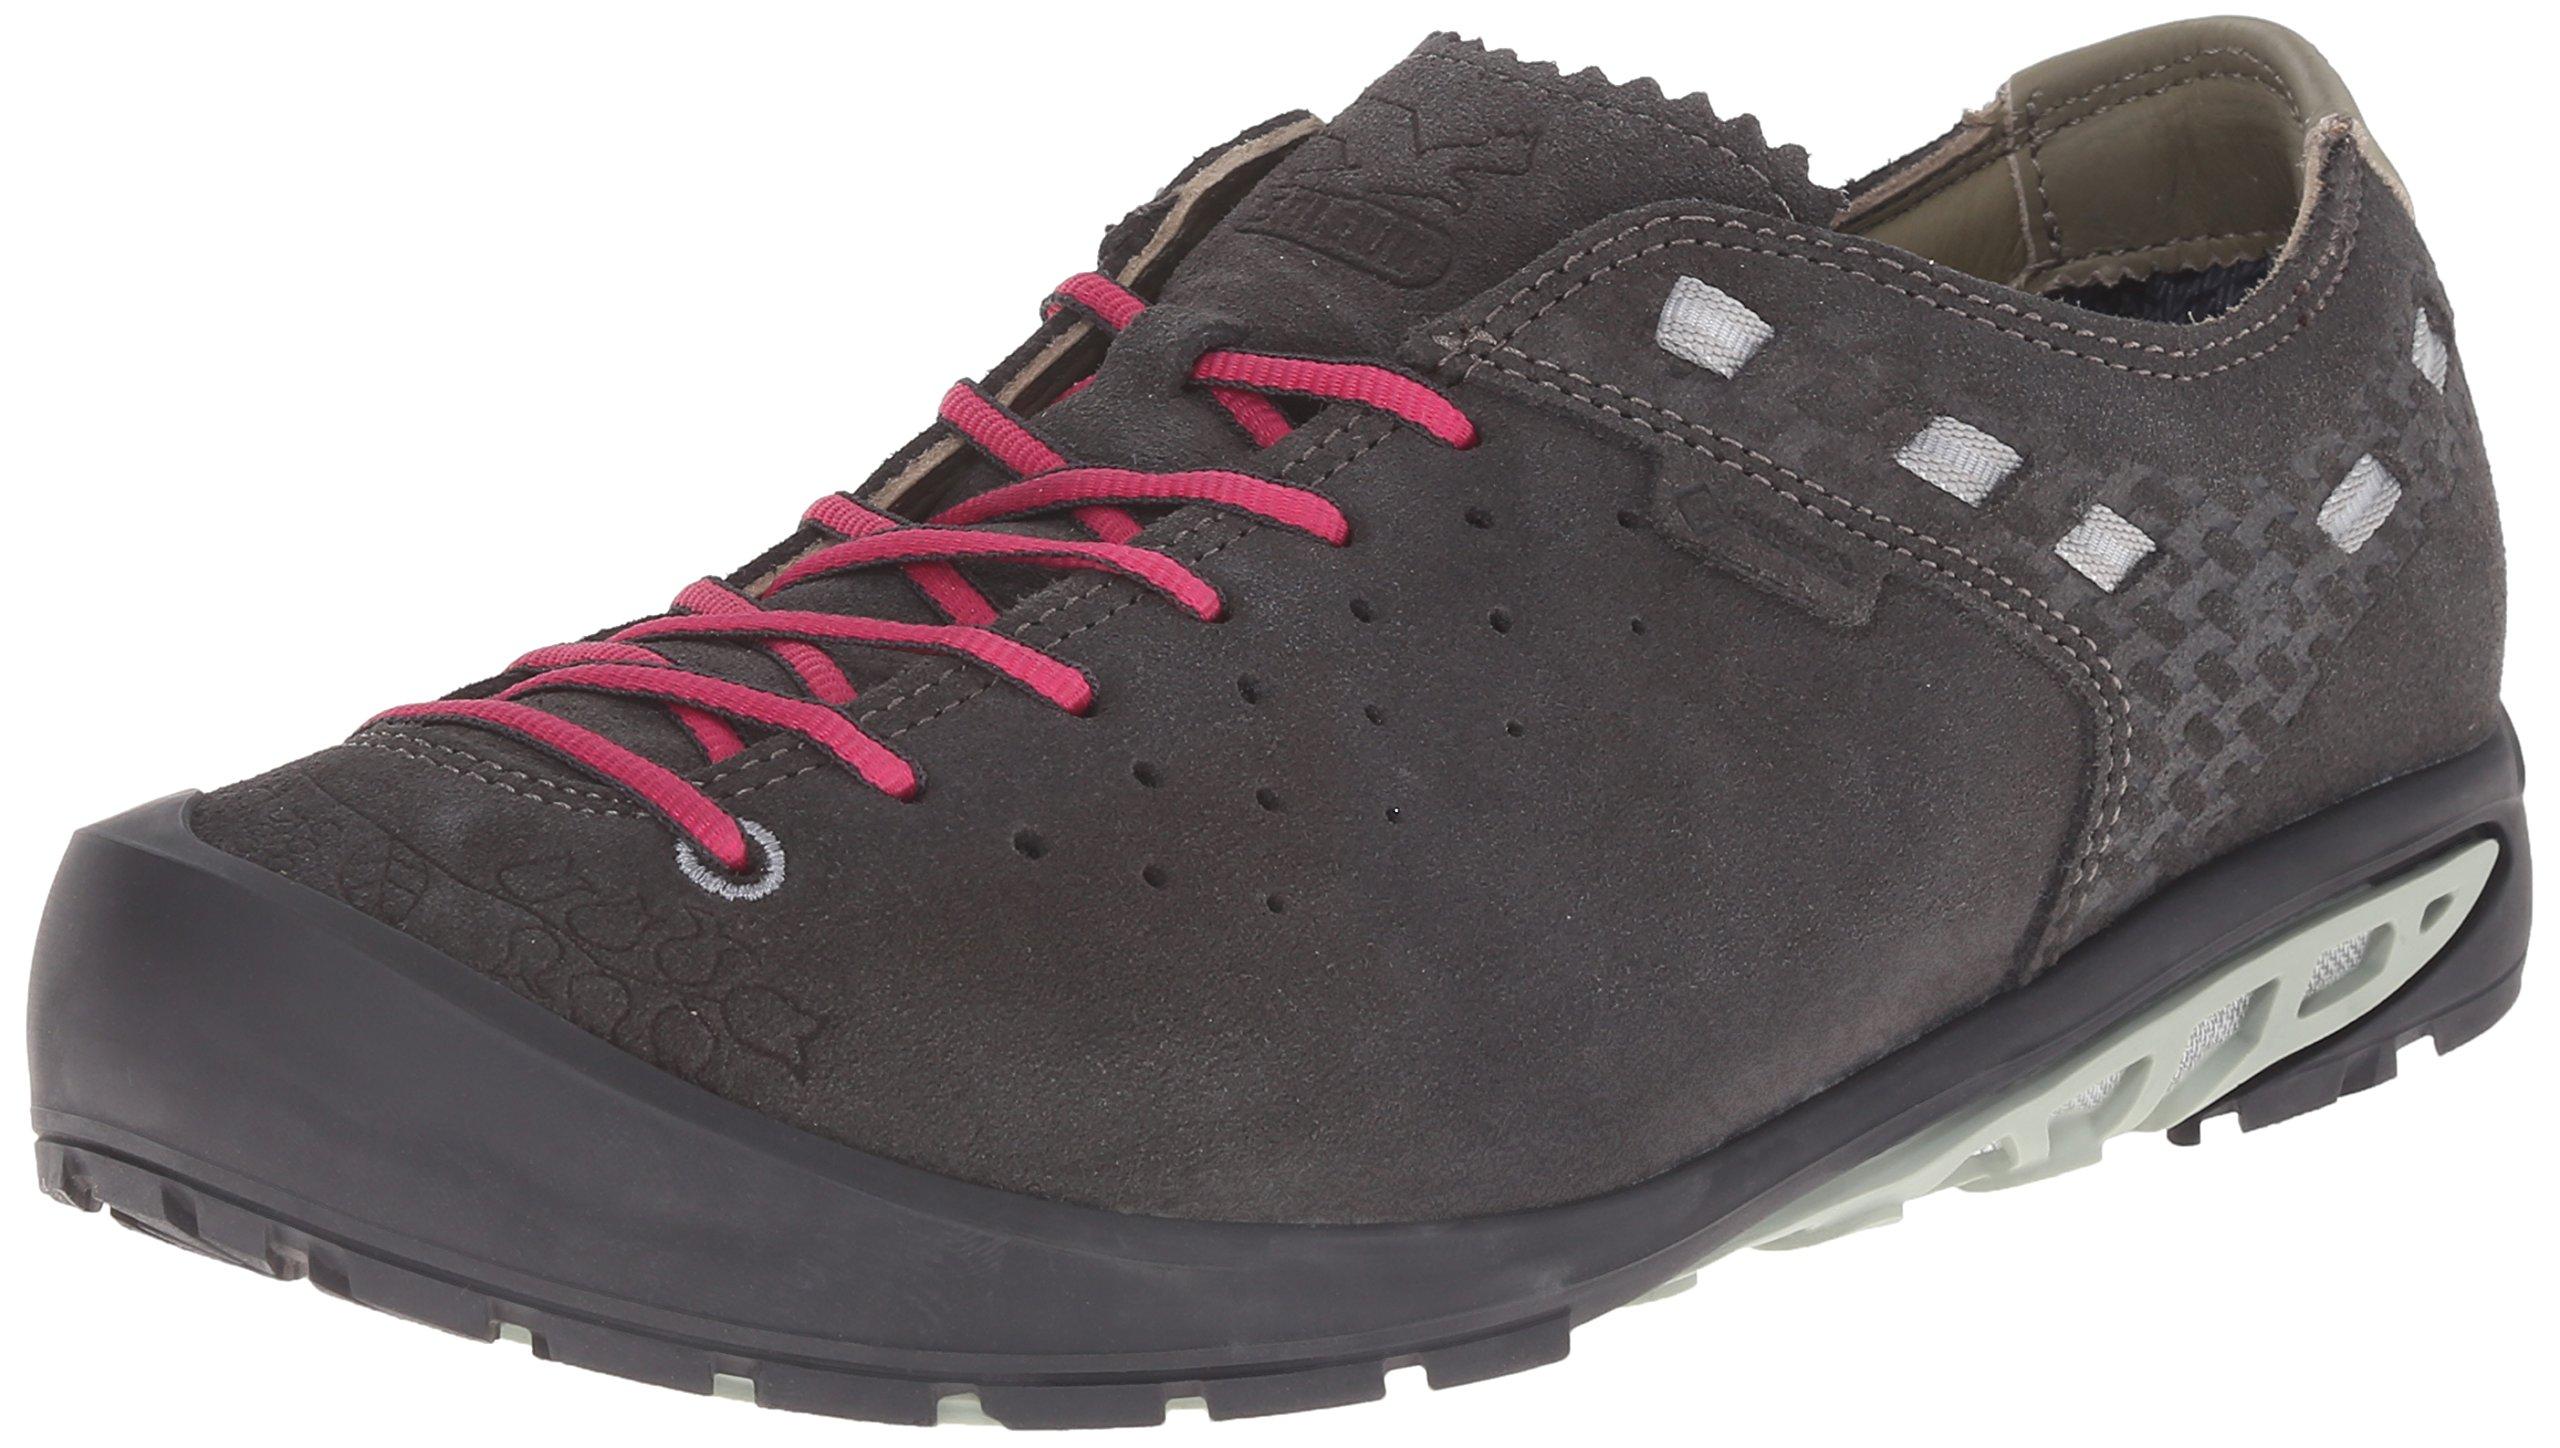 Salewa Women's Ramble GTX Alpine Lifestyle Shoe, Pixie/Siberia, 9 M US